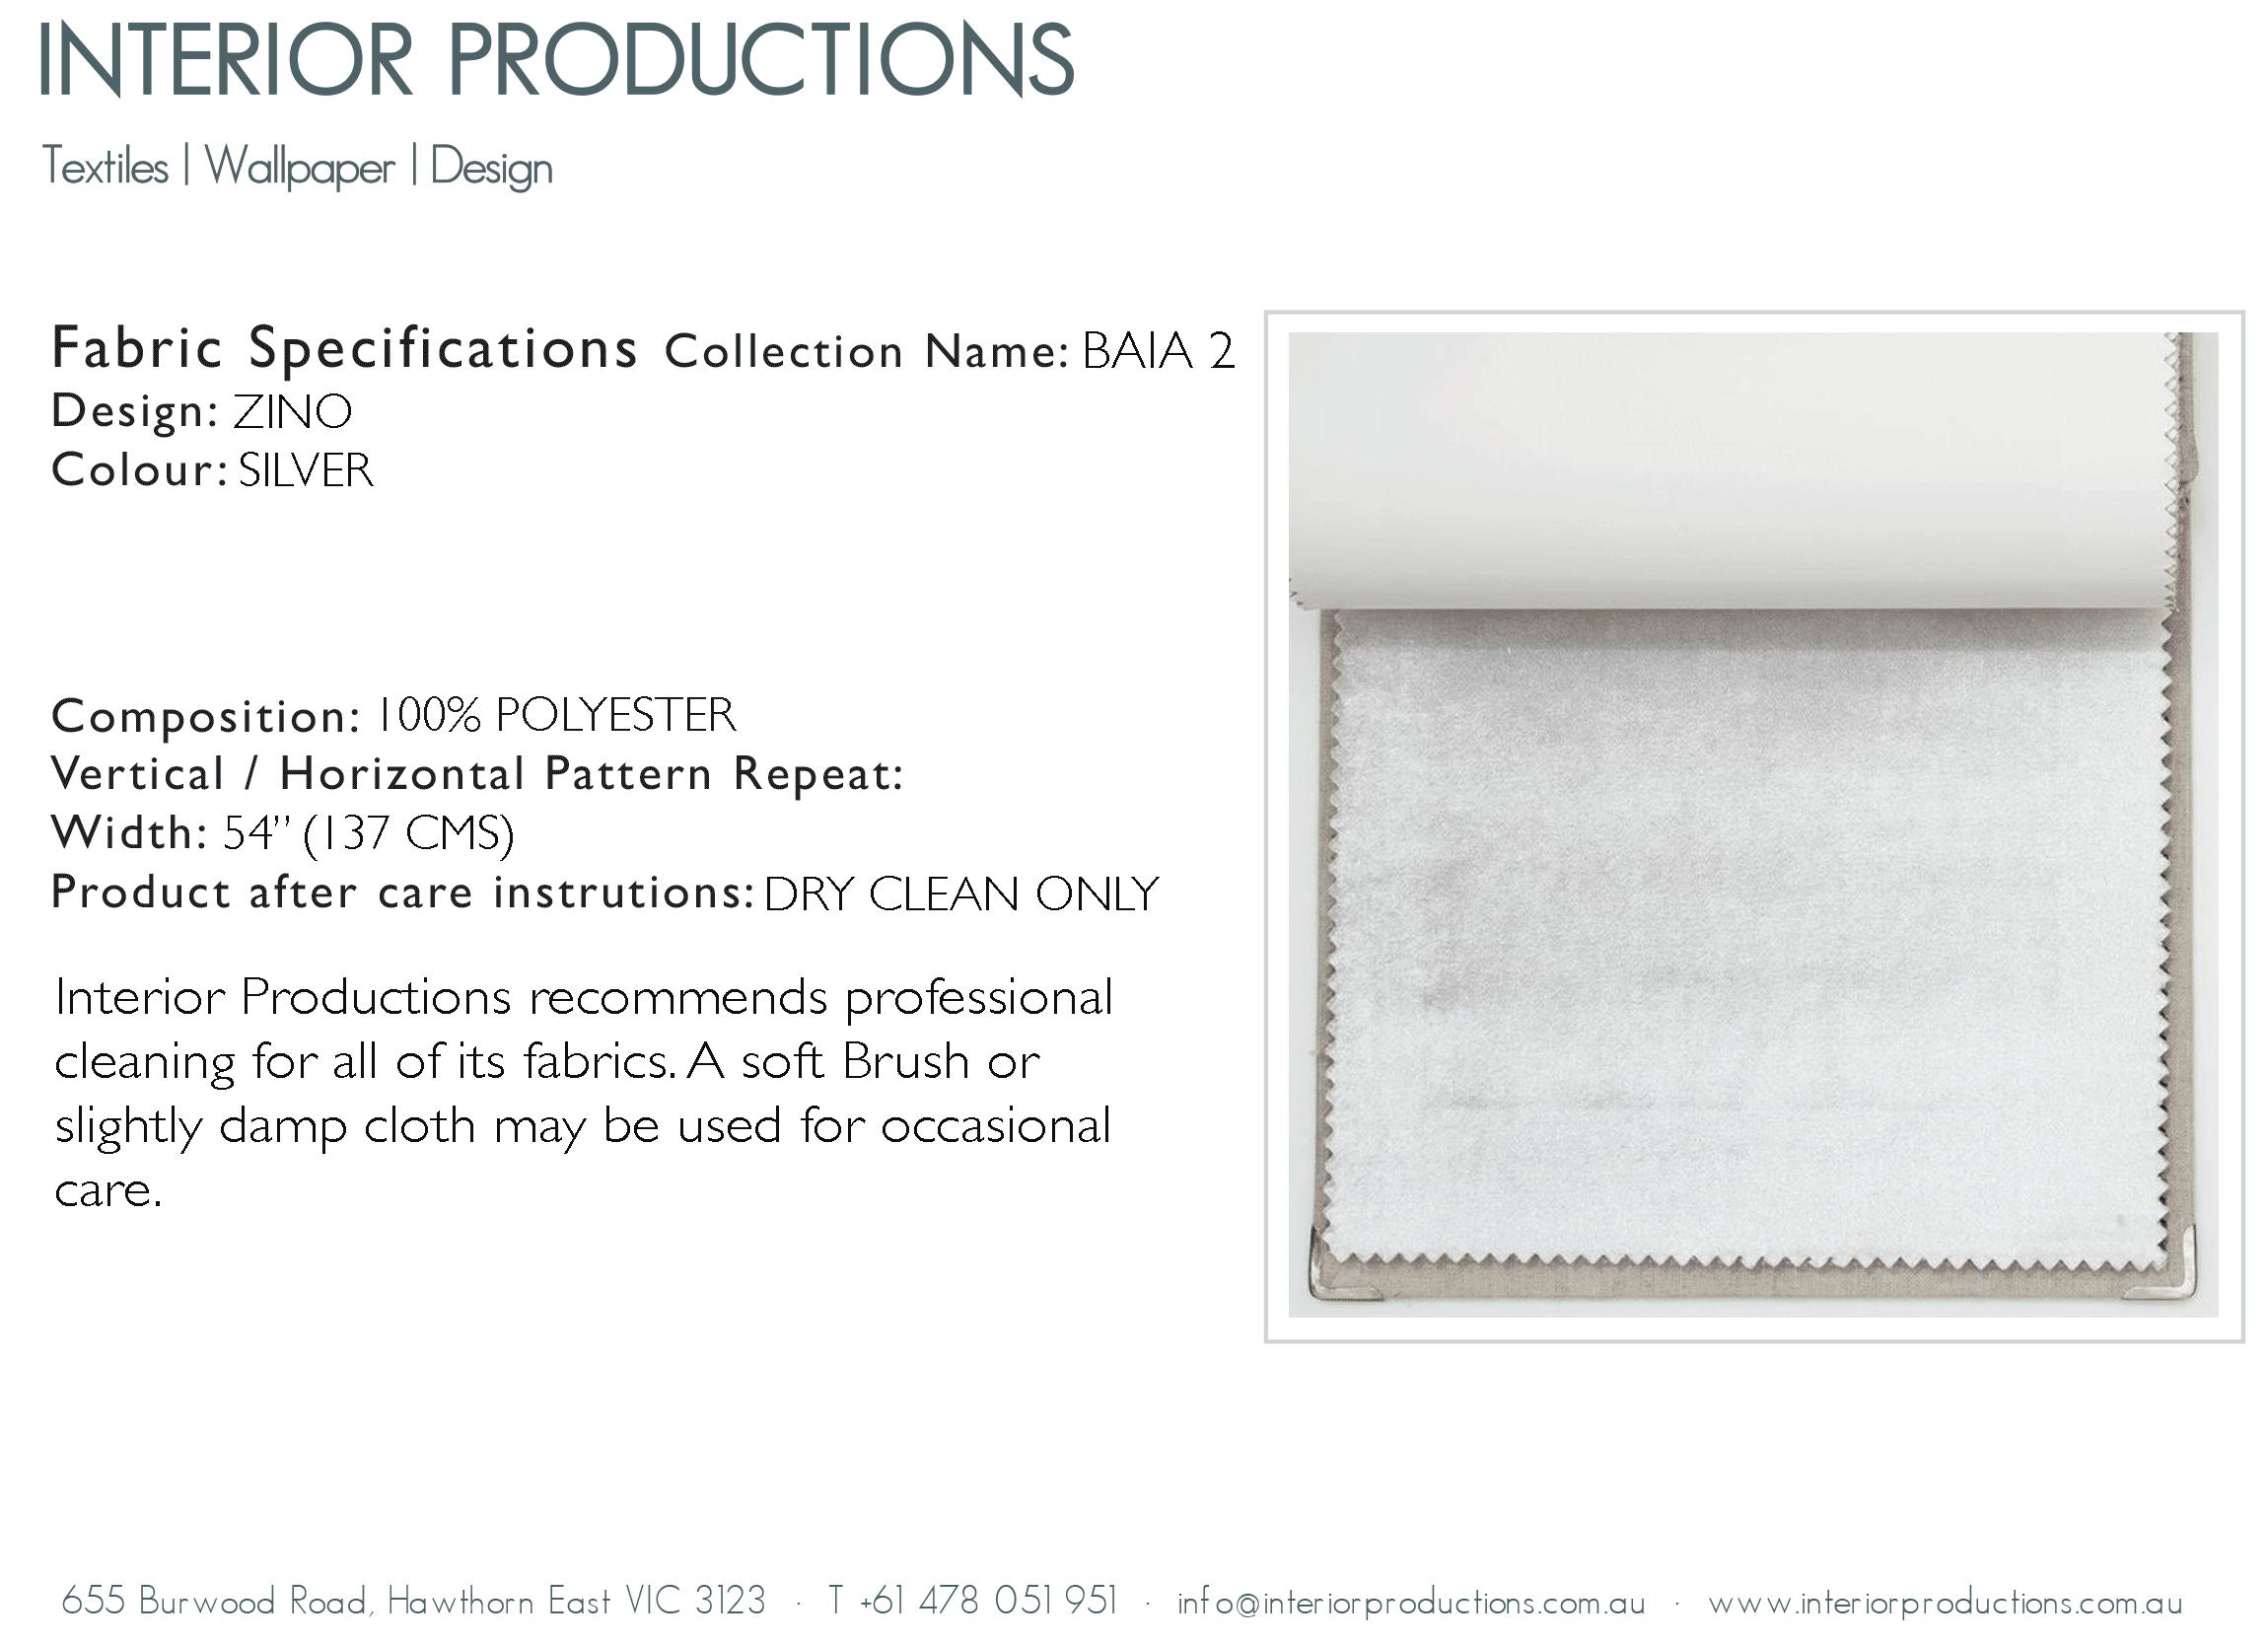 interior_productions_ZINO---SILVER